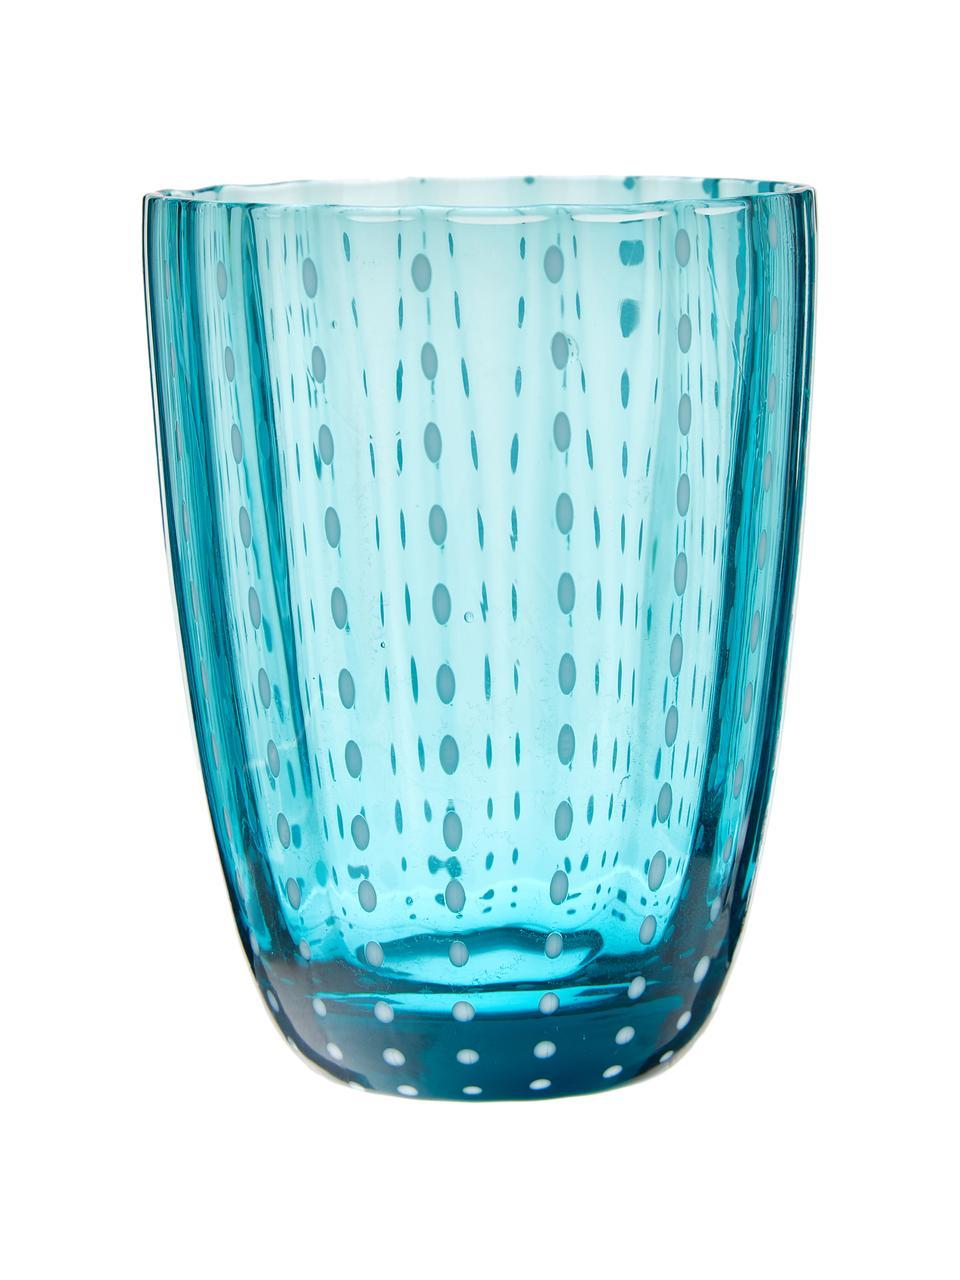 Wassergläser Kalahari in Blautönen, 6 Stück, Glas, Mehrfarbig, Ø 9 x H 11 cm